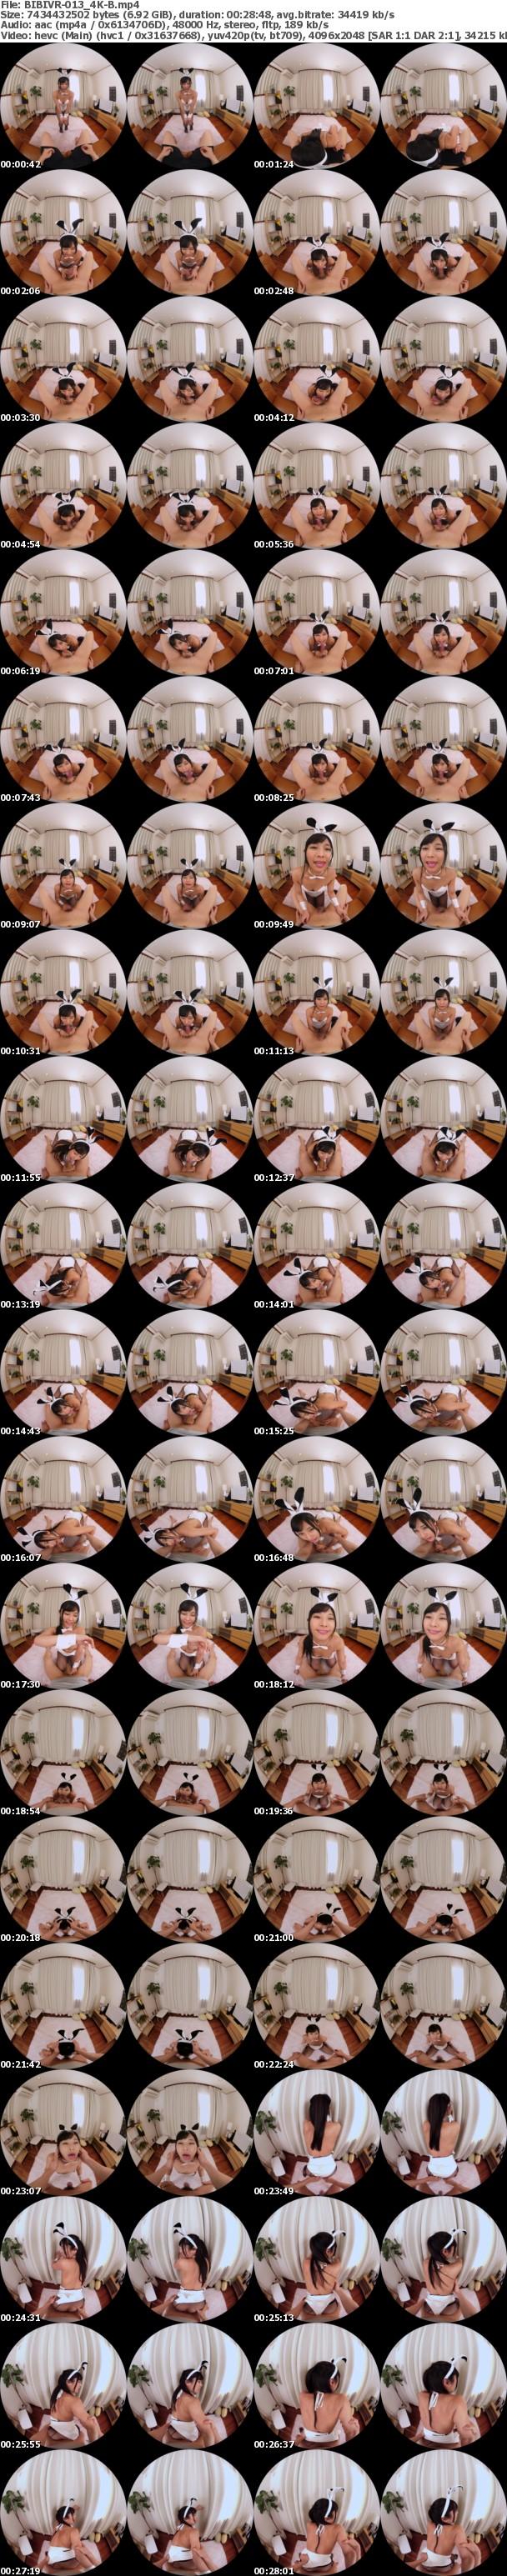 (VR) (4K) BIBIVR-013 一日限定。同棲中のボクの彼女はバニーガールフェラチオマシーン 久留木玲